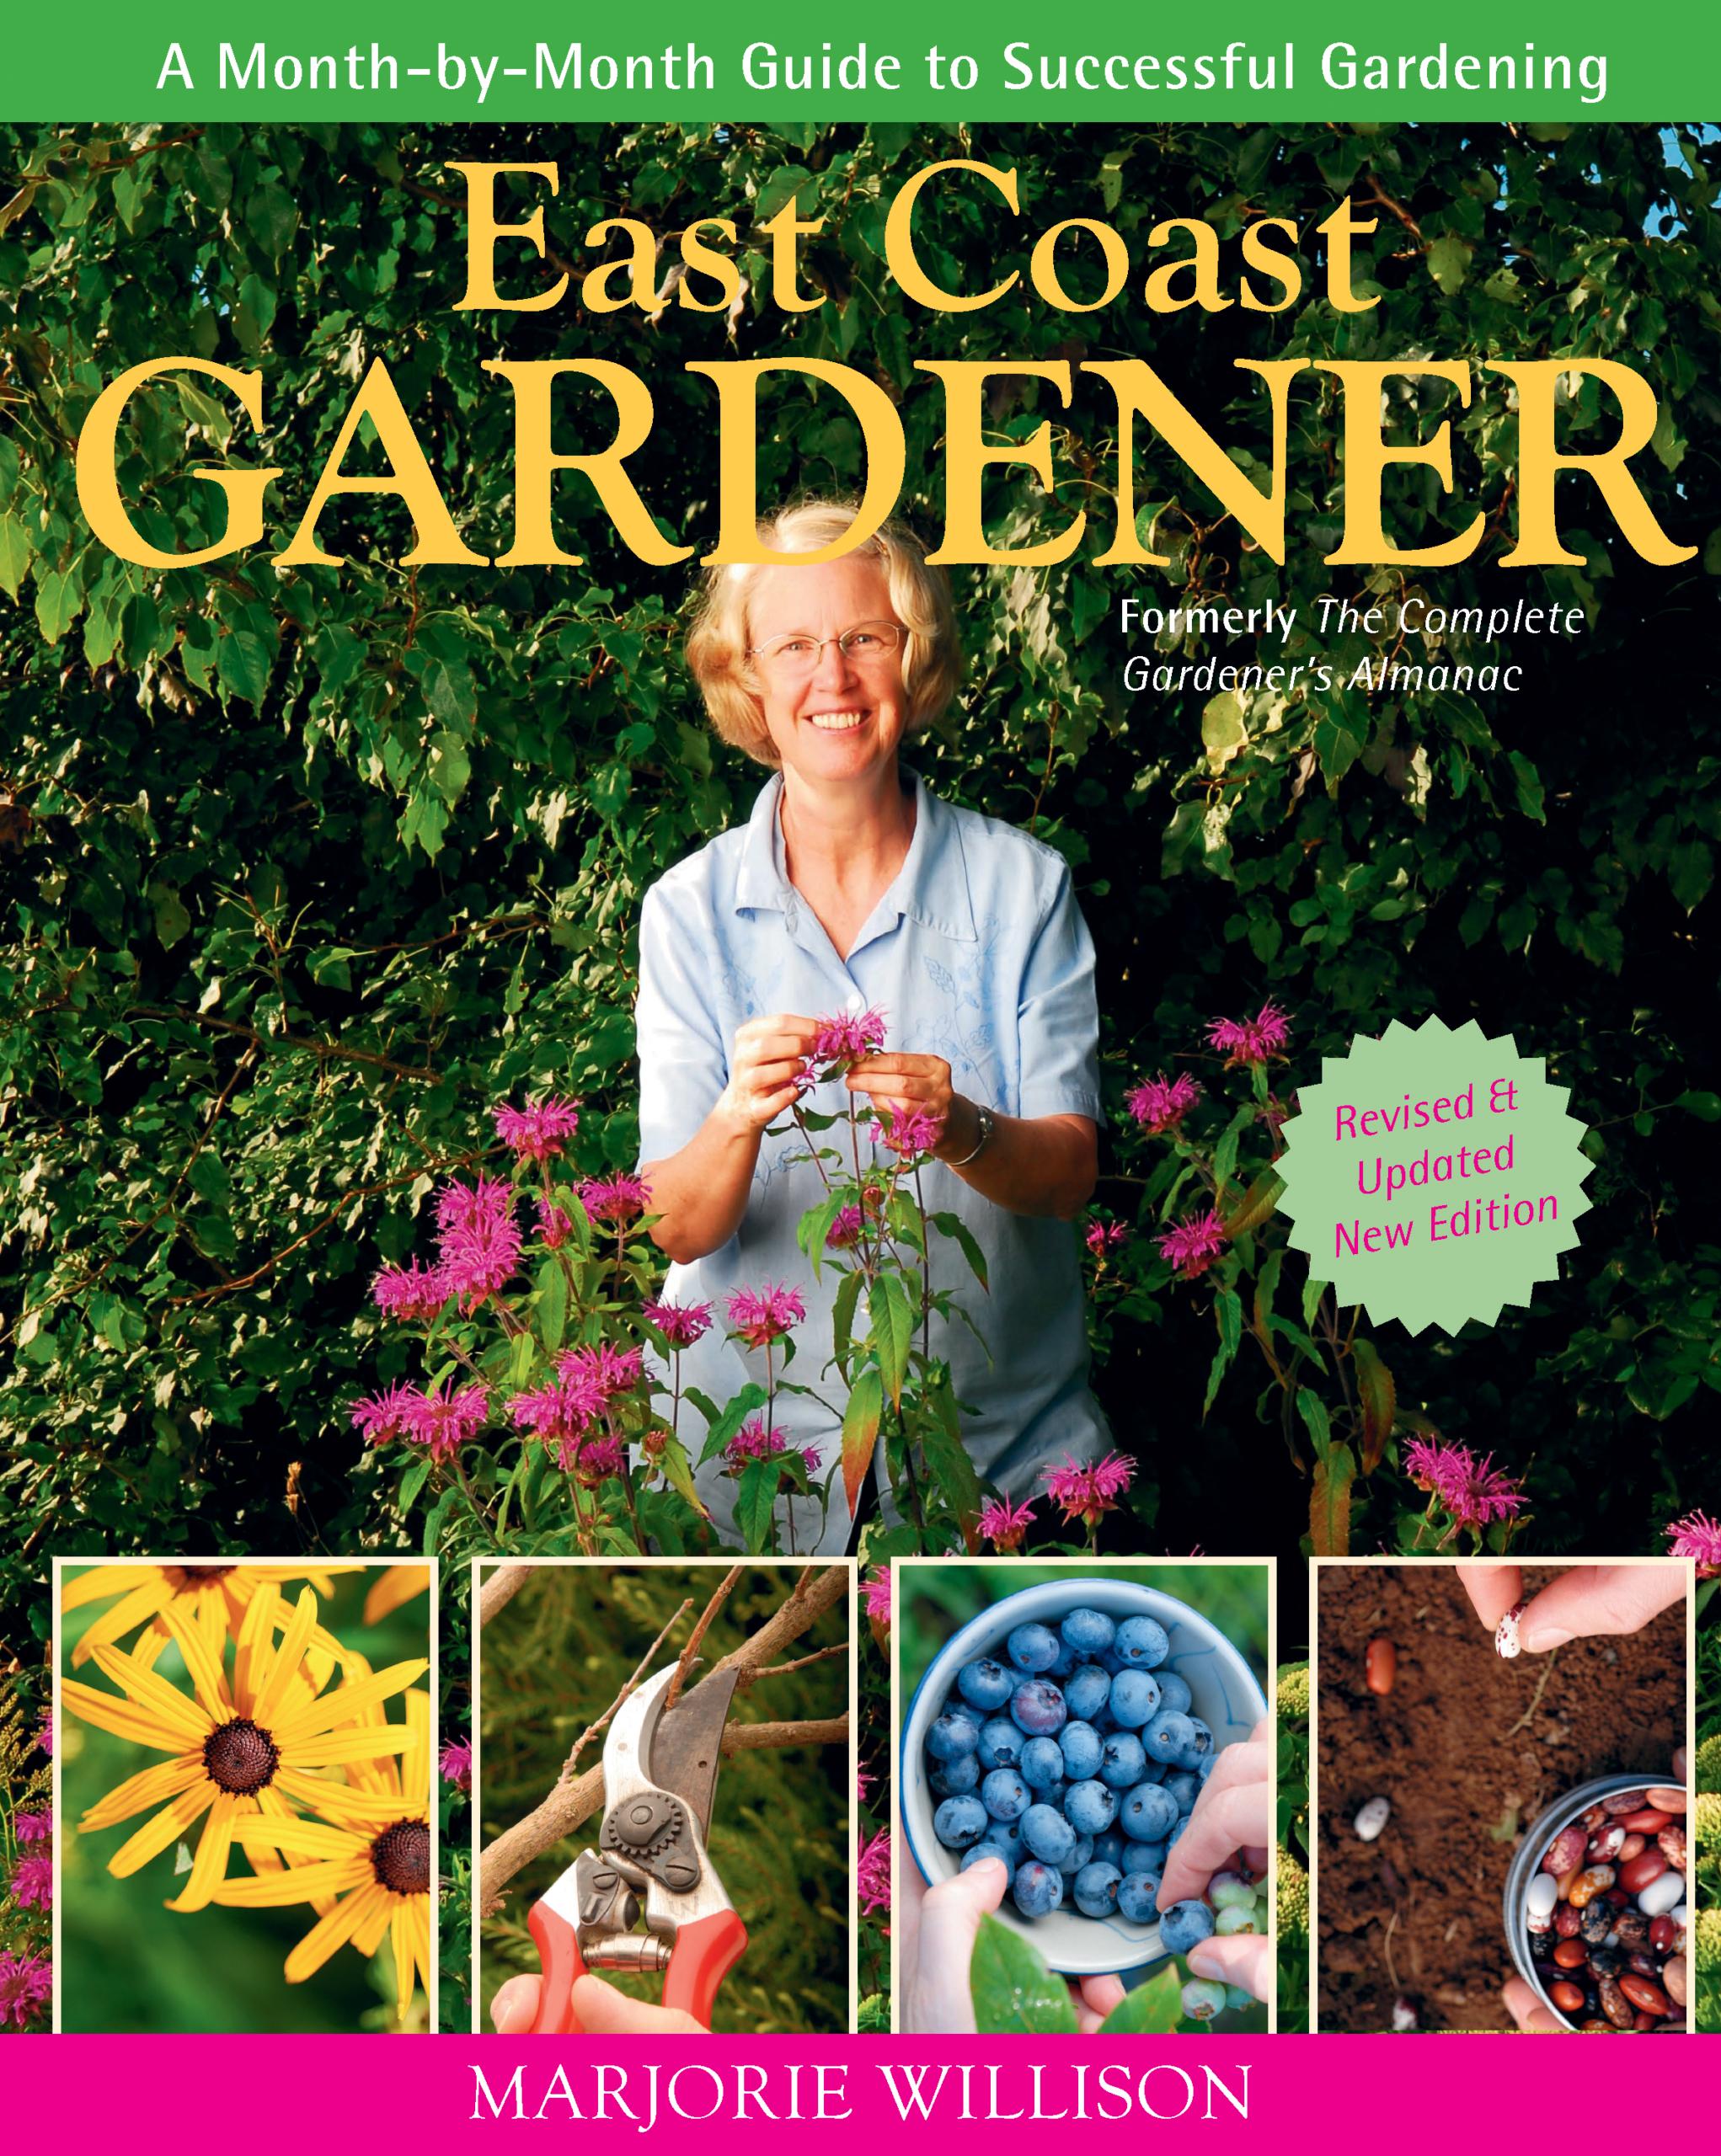 East Coast Gardener